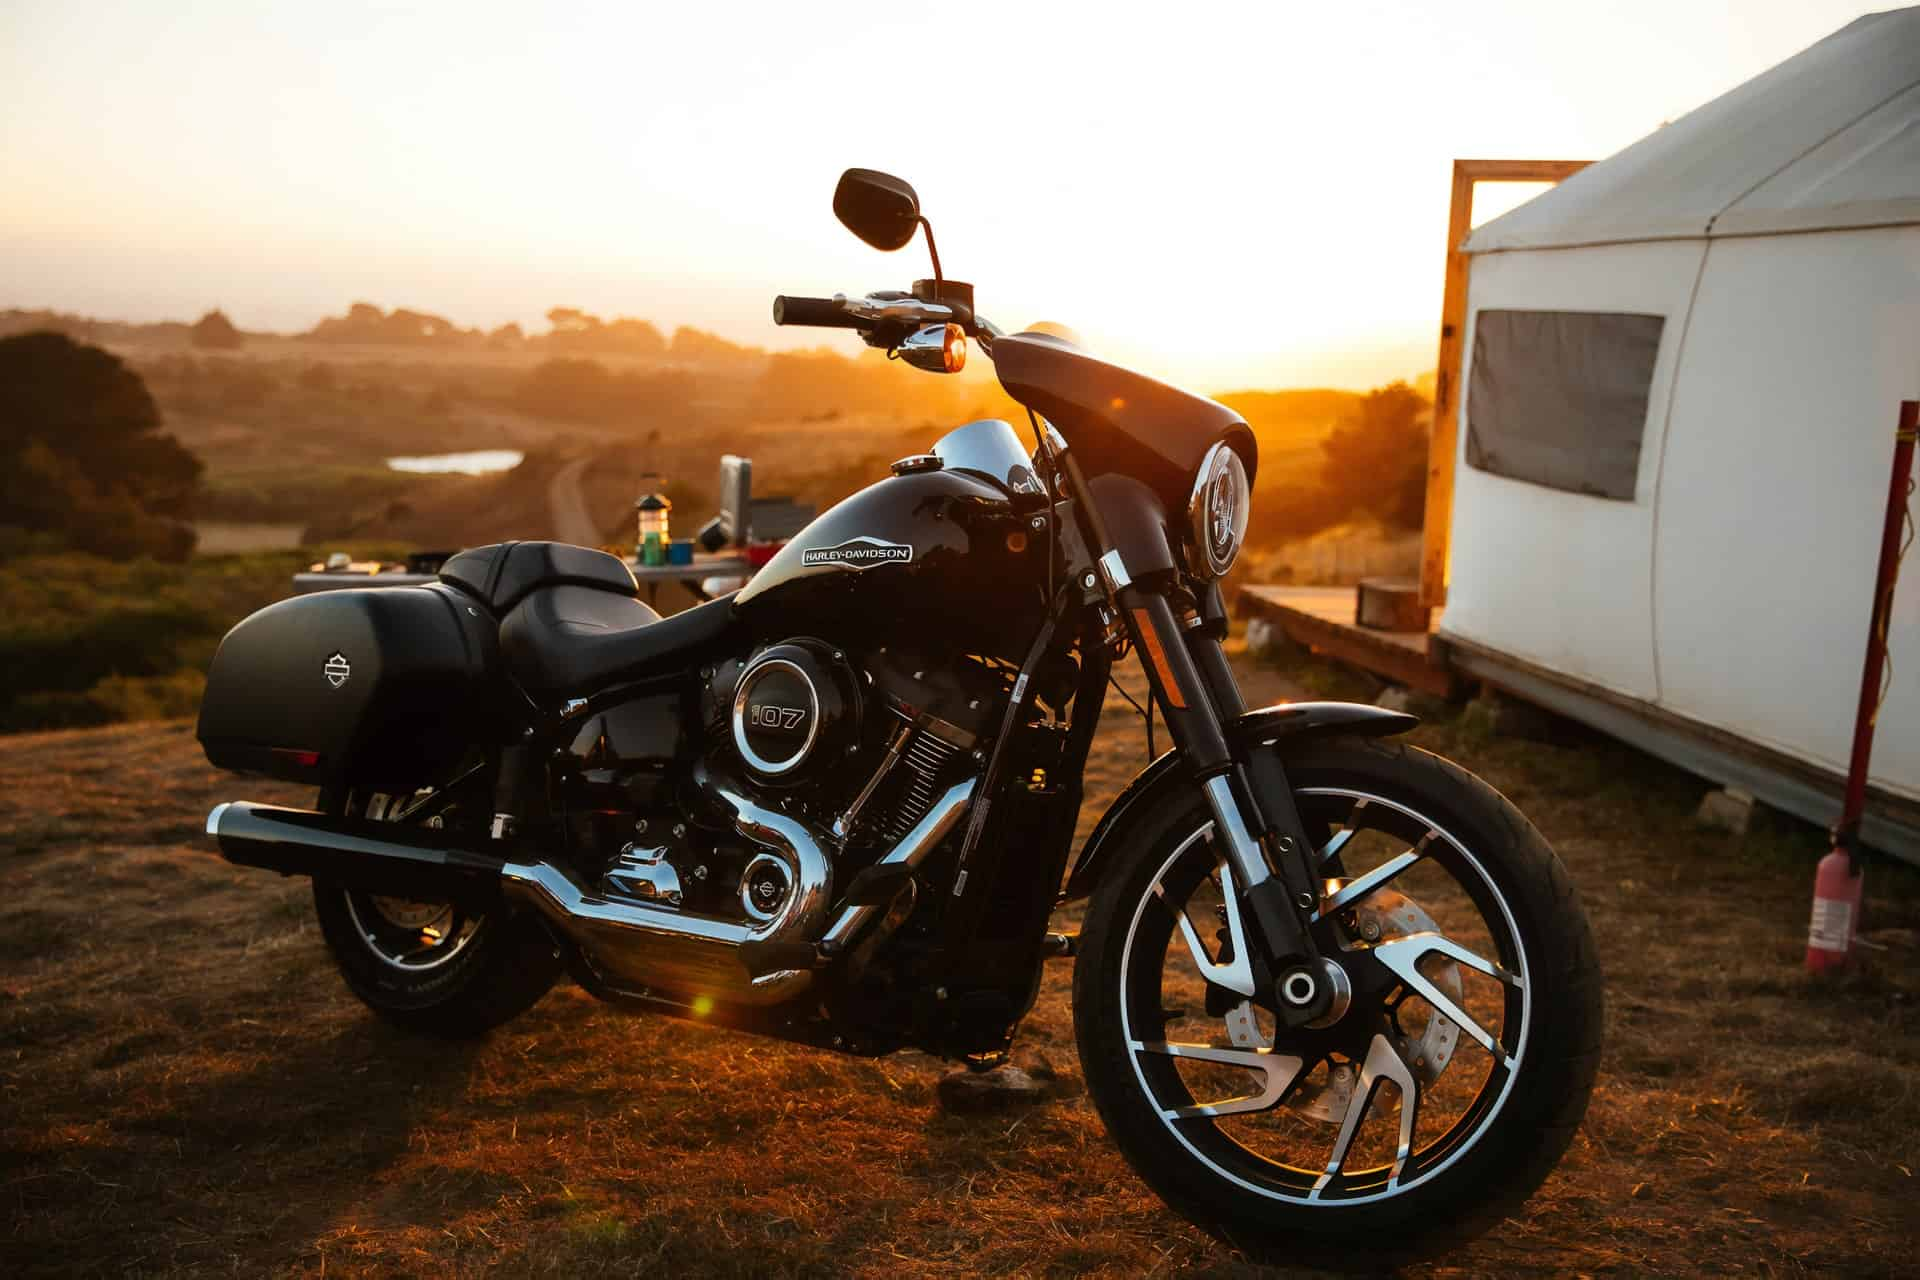 harley sunset new motorcycle